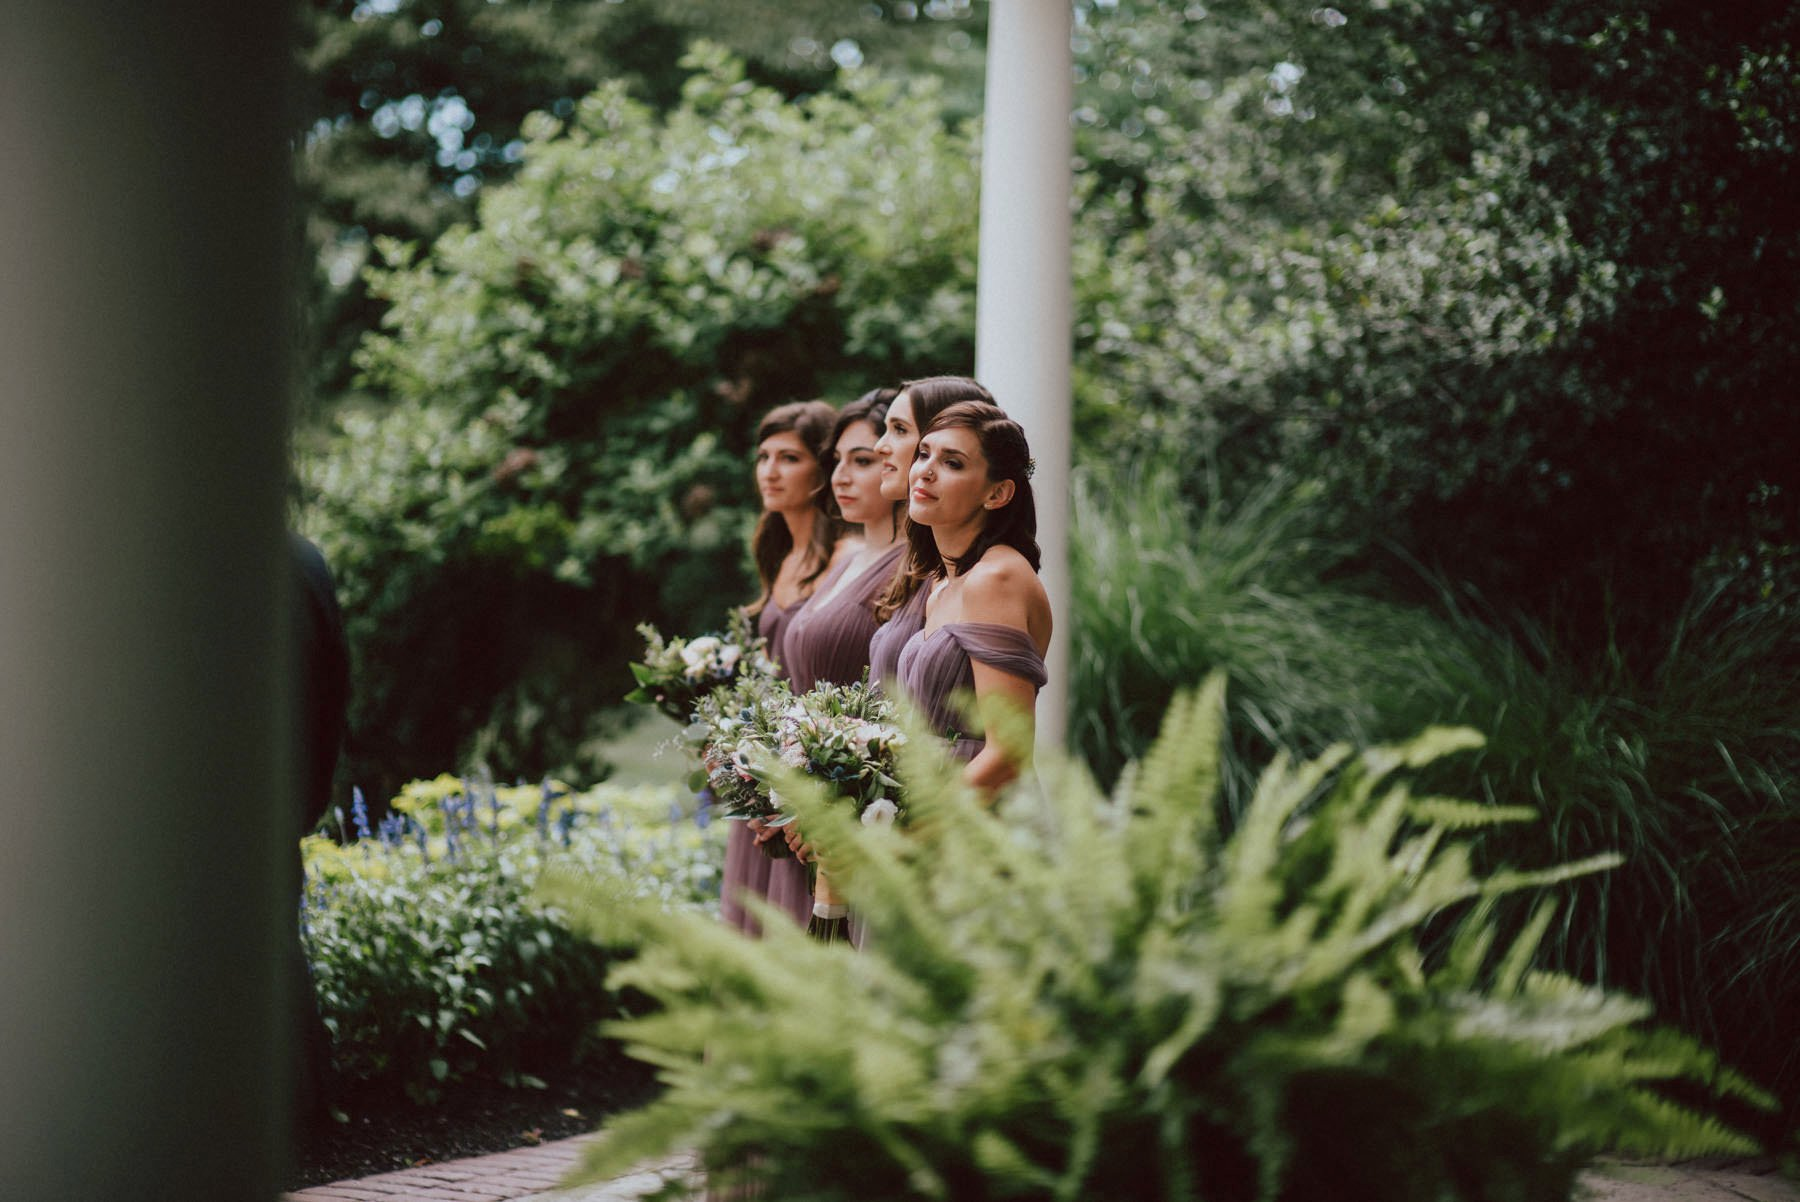 Knowlton-mansion-wedding-94.jpg